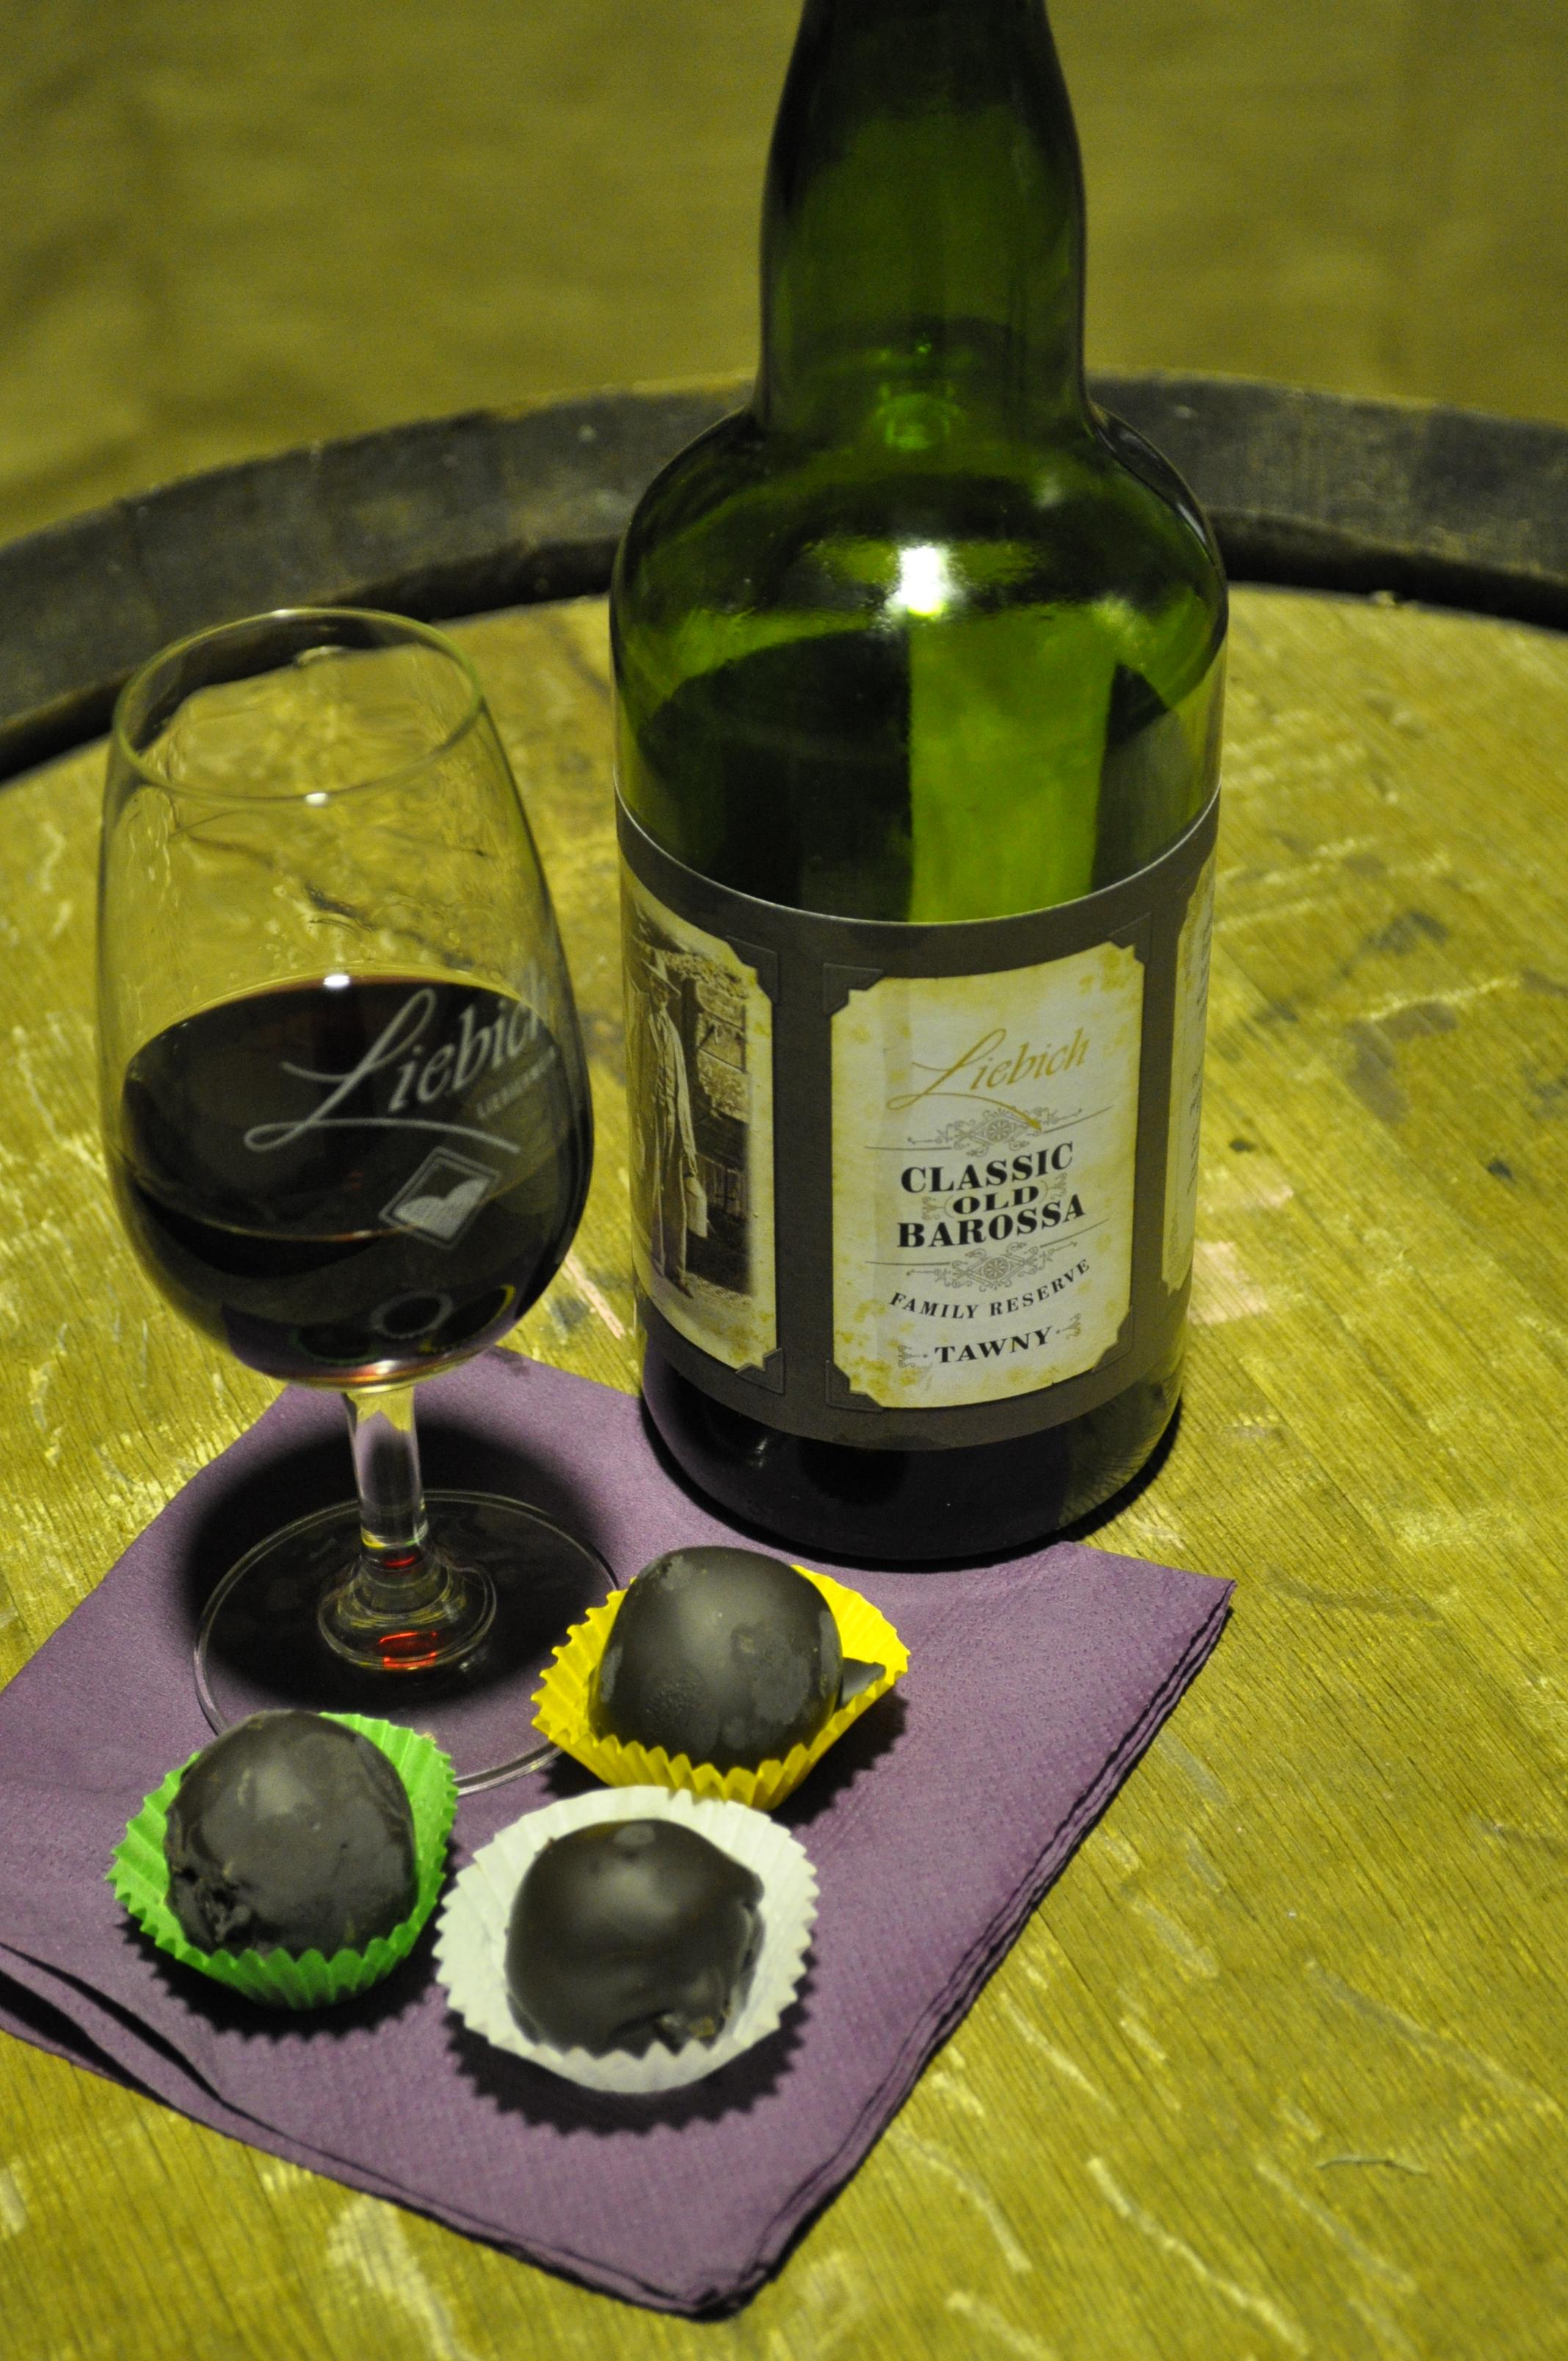 Barossa Gourmet Invite: Fortified & Dessert Masterclass